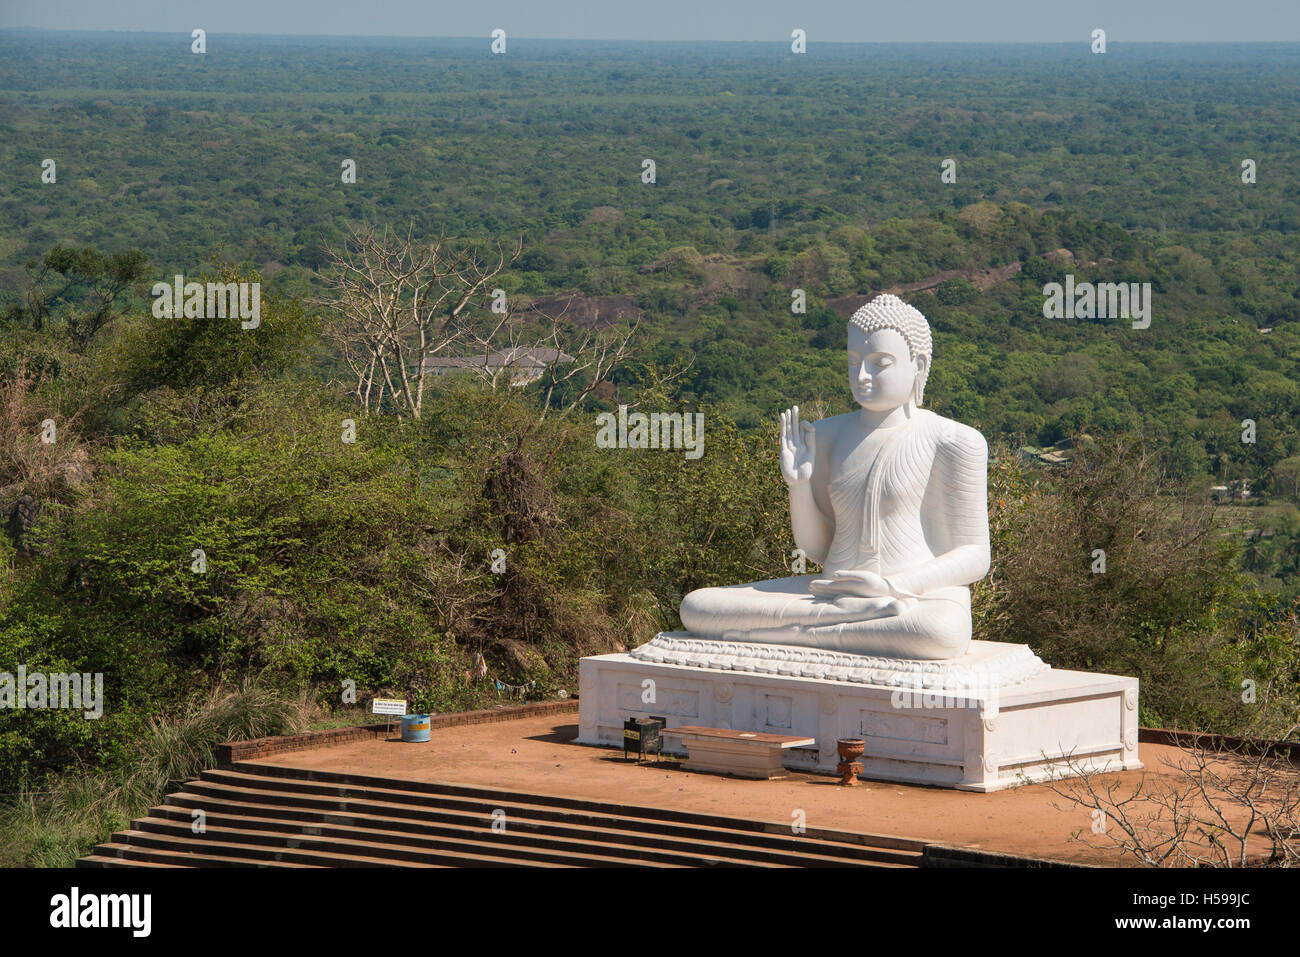 The great seated Buddha at Mihintale, Anuradhapura, Sri Lanka Stock Photo